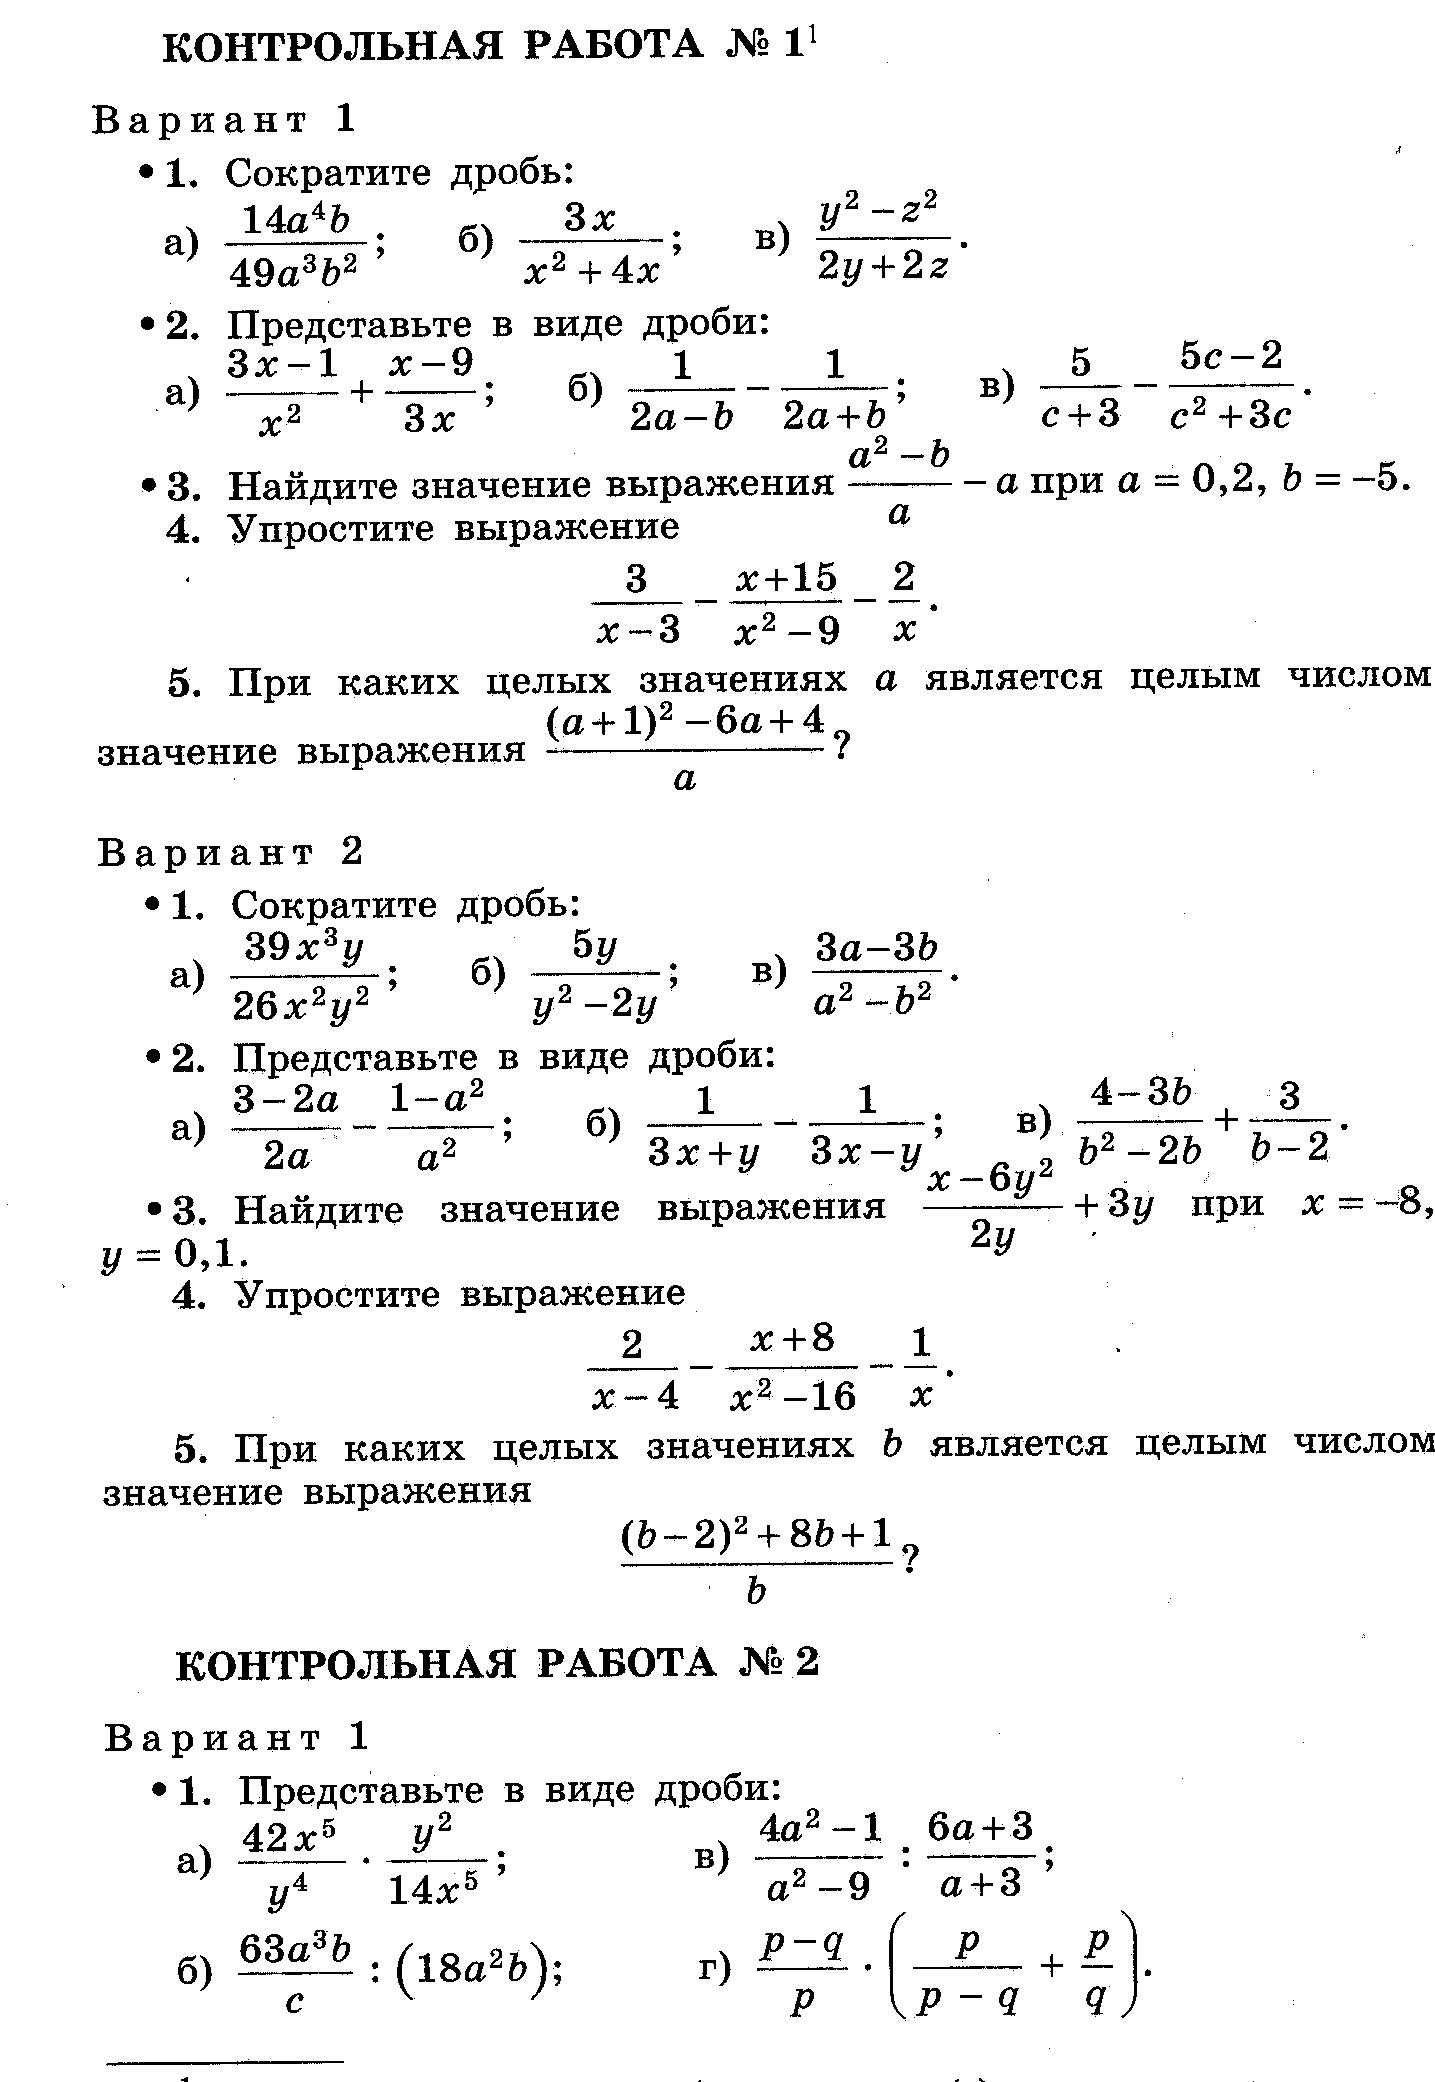 Тест за 1 полугодие по математике для 2-го класса